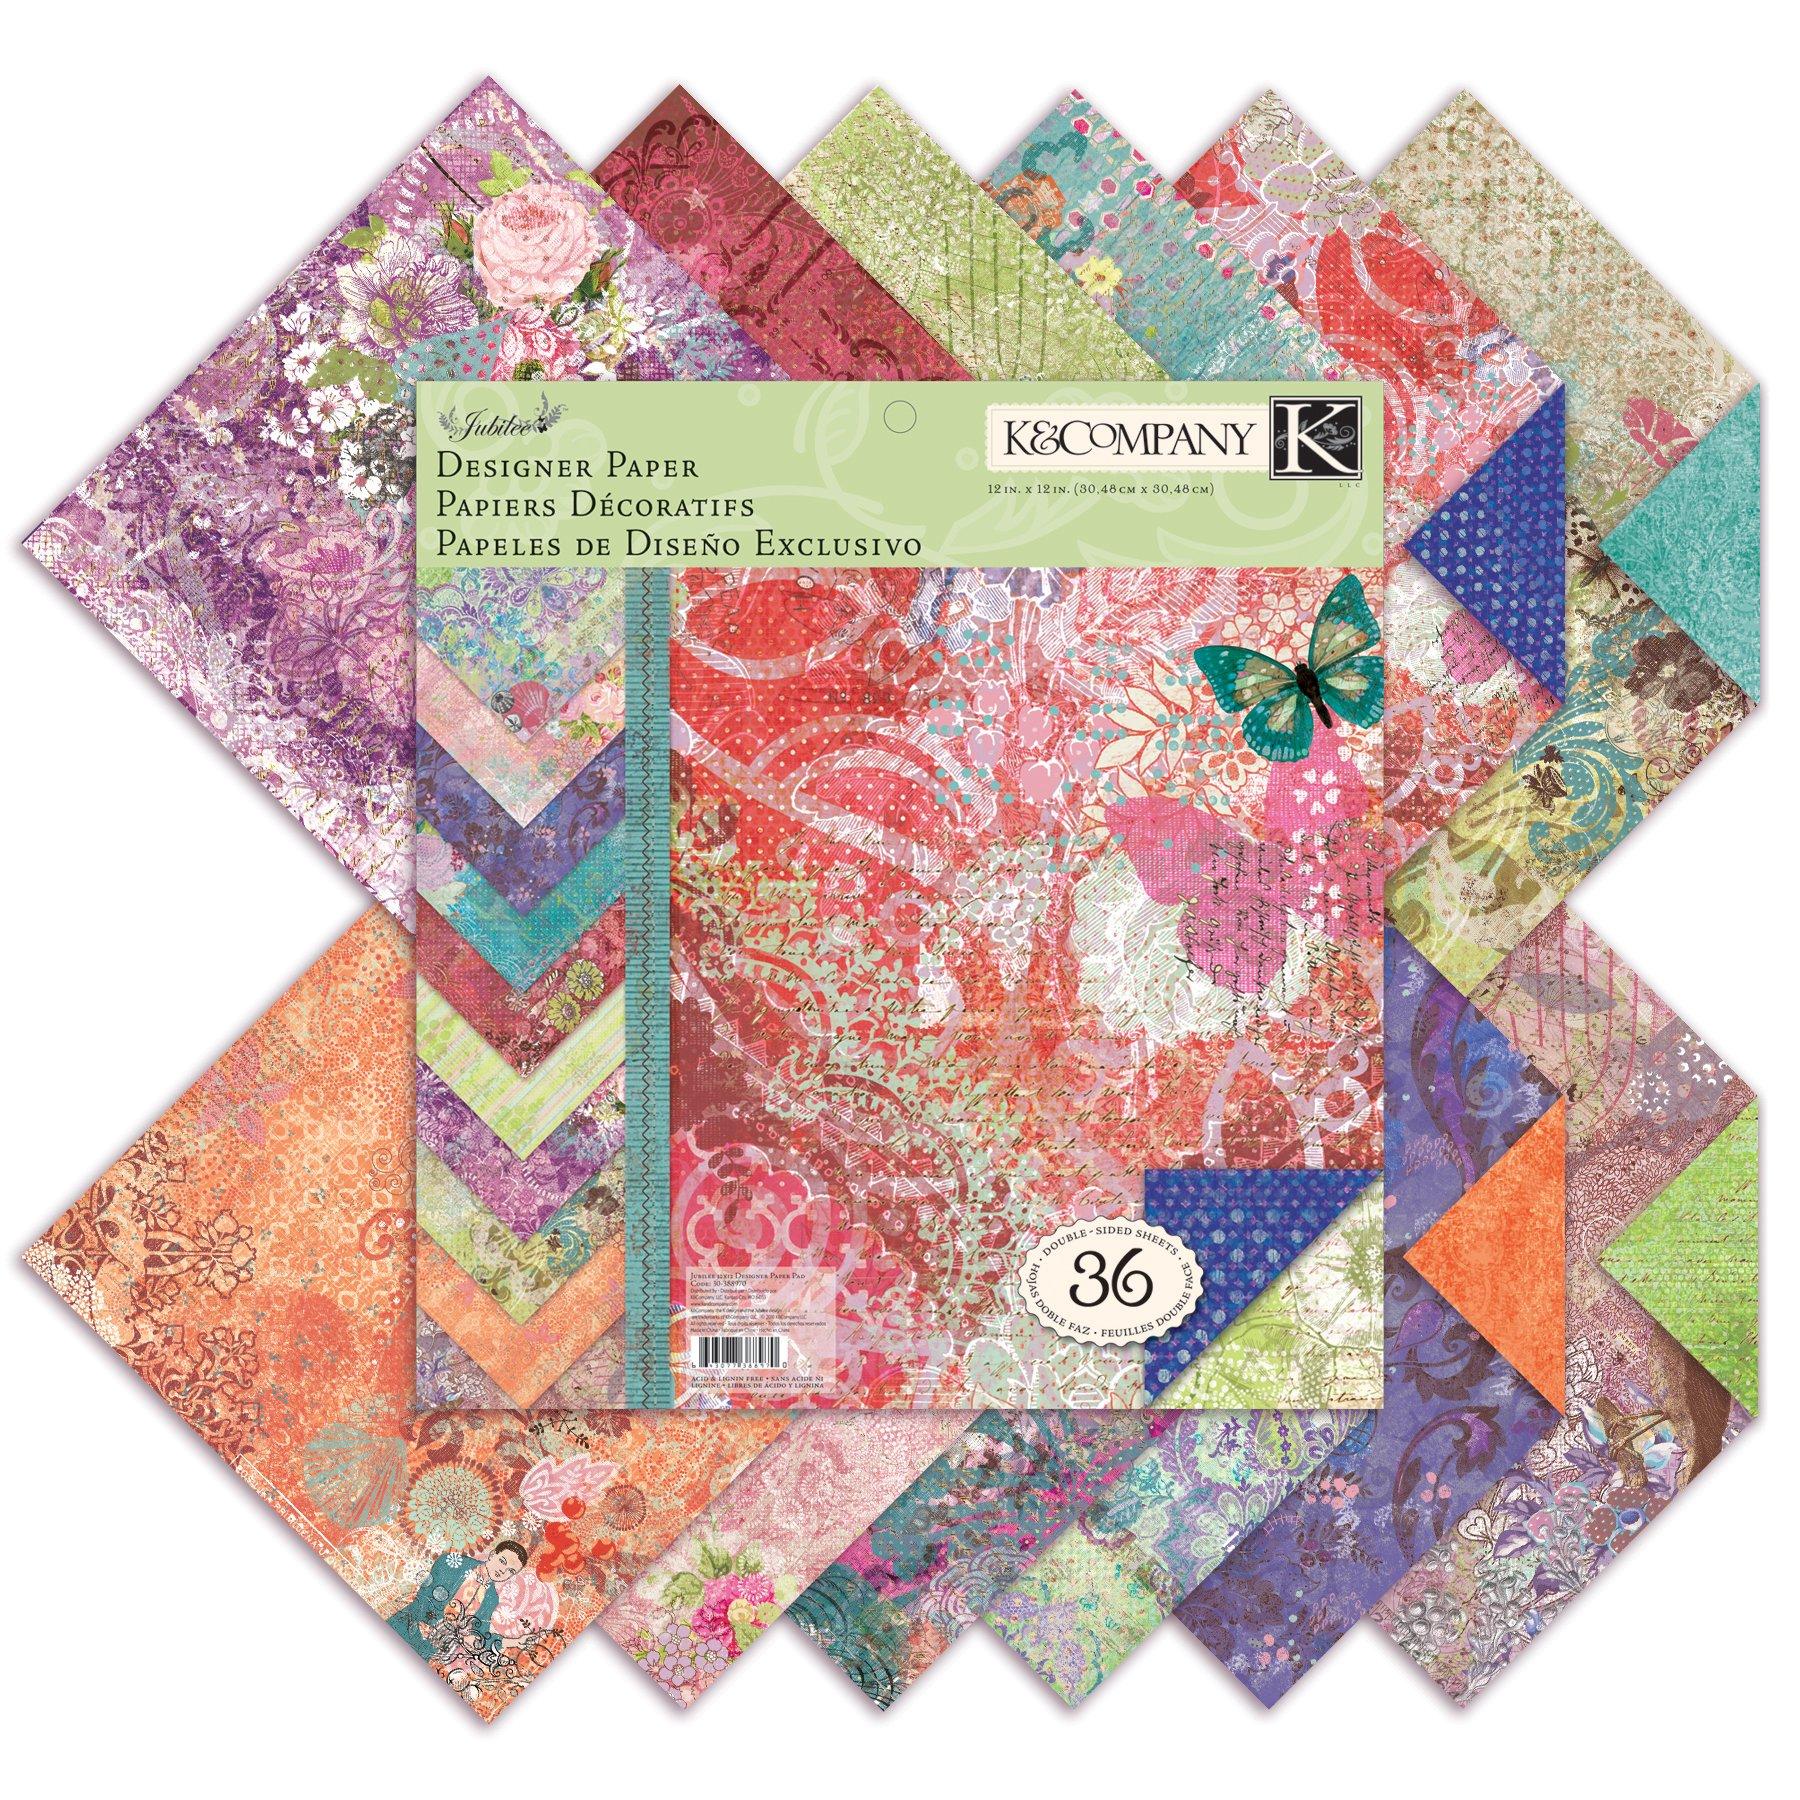 K&Company Jubilee Designer Paper Pad, 12-Inch- by-12-Inch